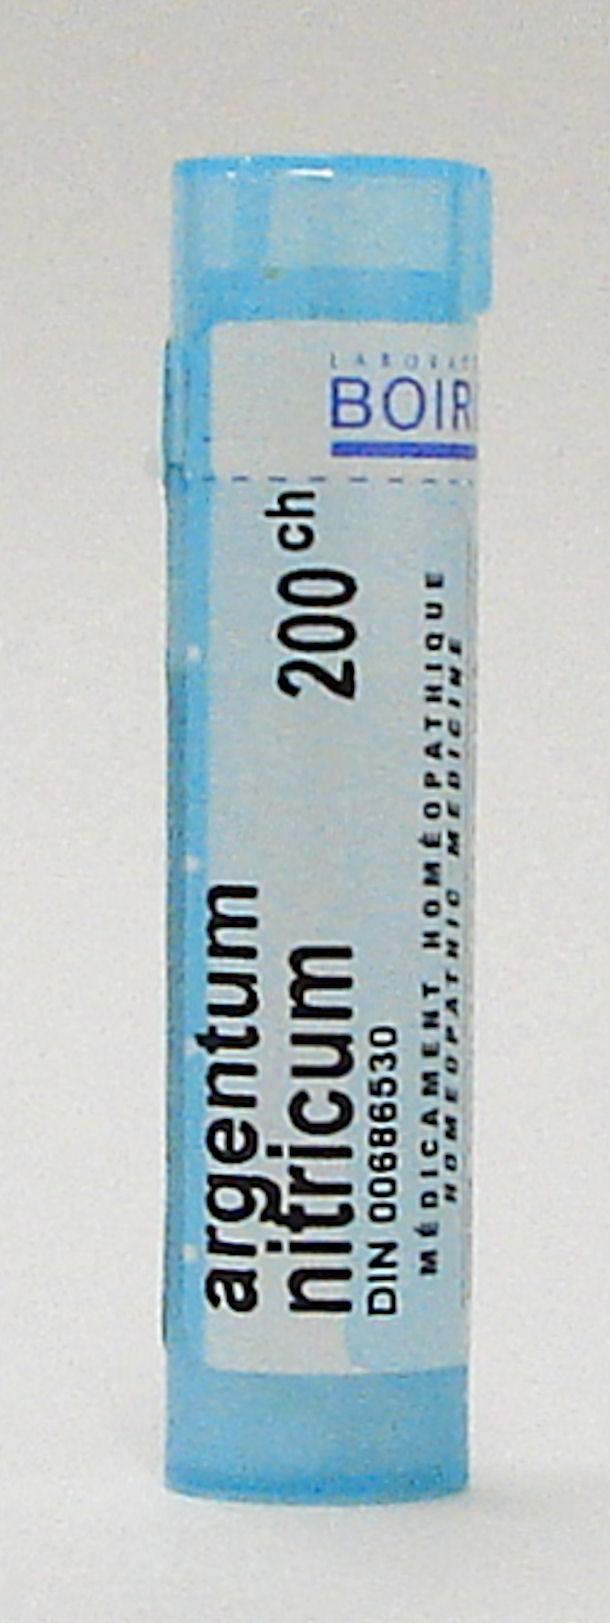 argentum nitricum 200 ch sublingual pellets (boiron)